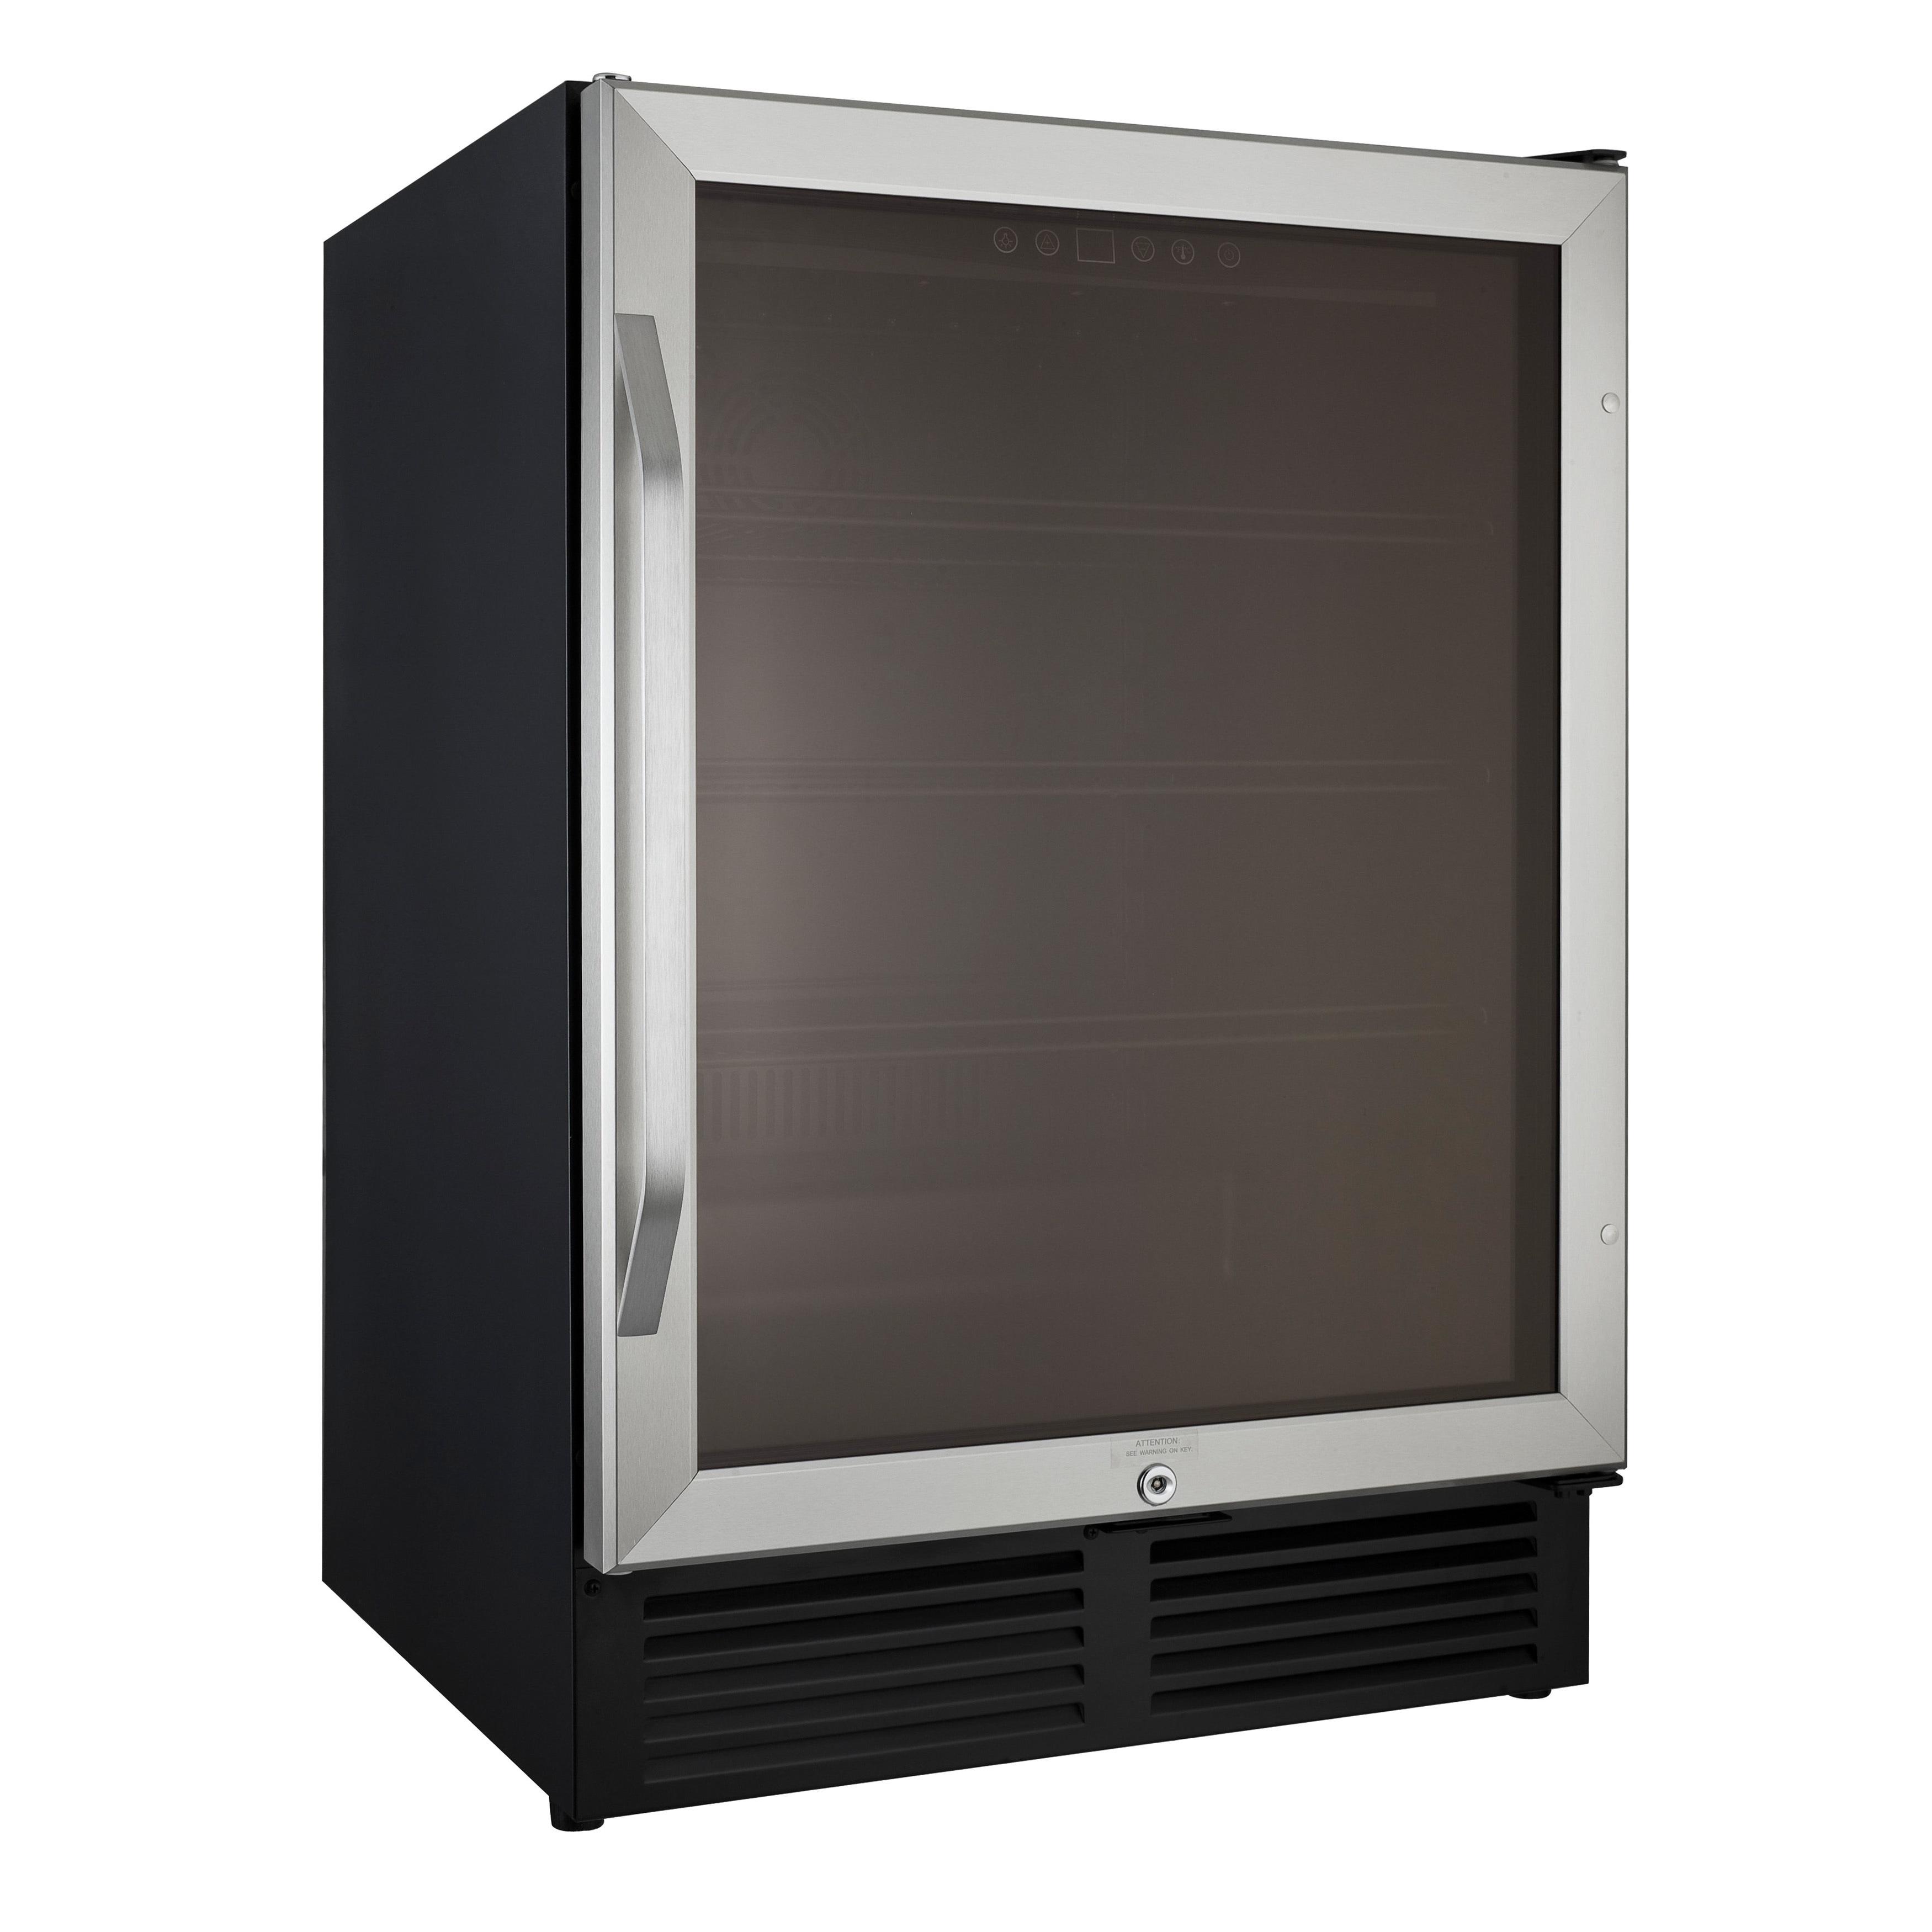 Avanti 5.0 Cubic Foot Glass Door Refrigerator, Silver Sta...